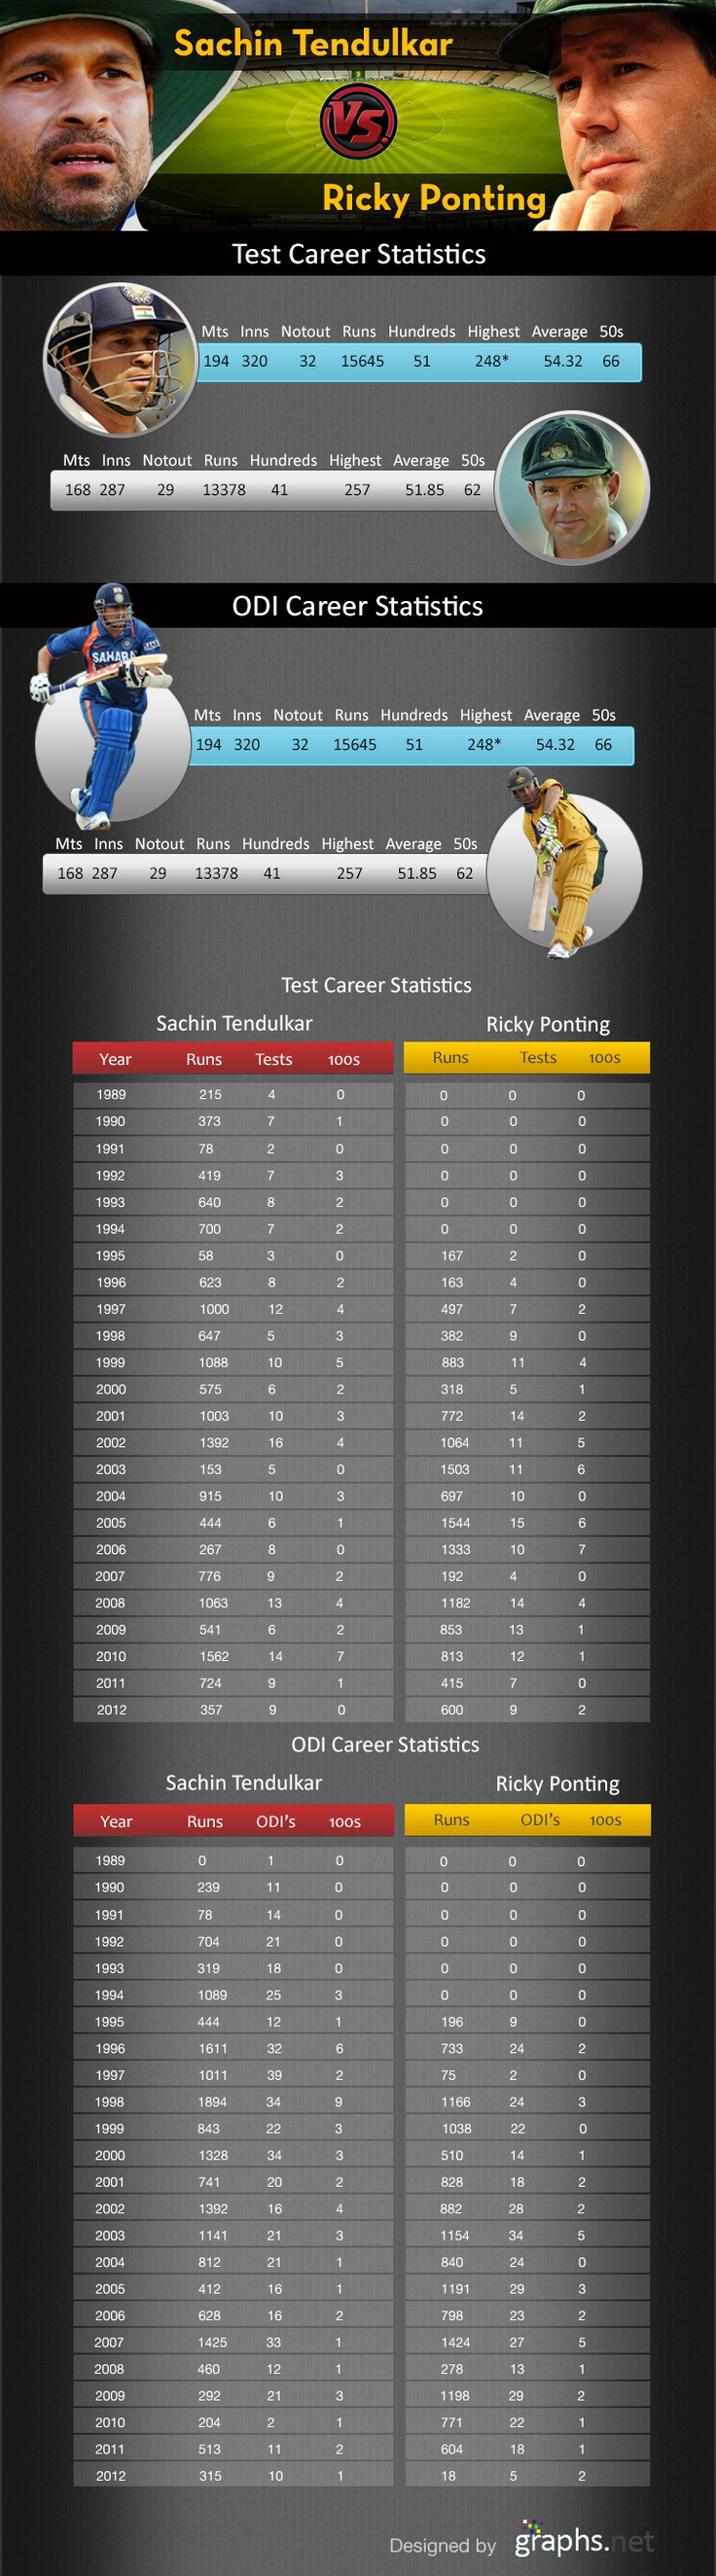 Sachin Tendulkar vs Ricky Ponting Statistics